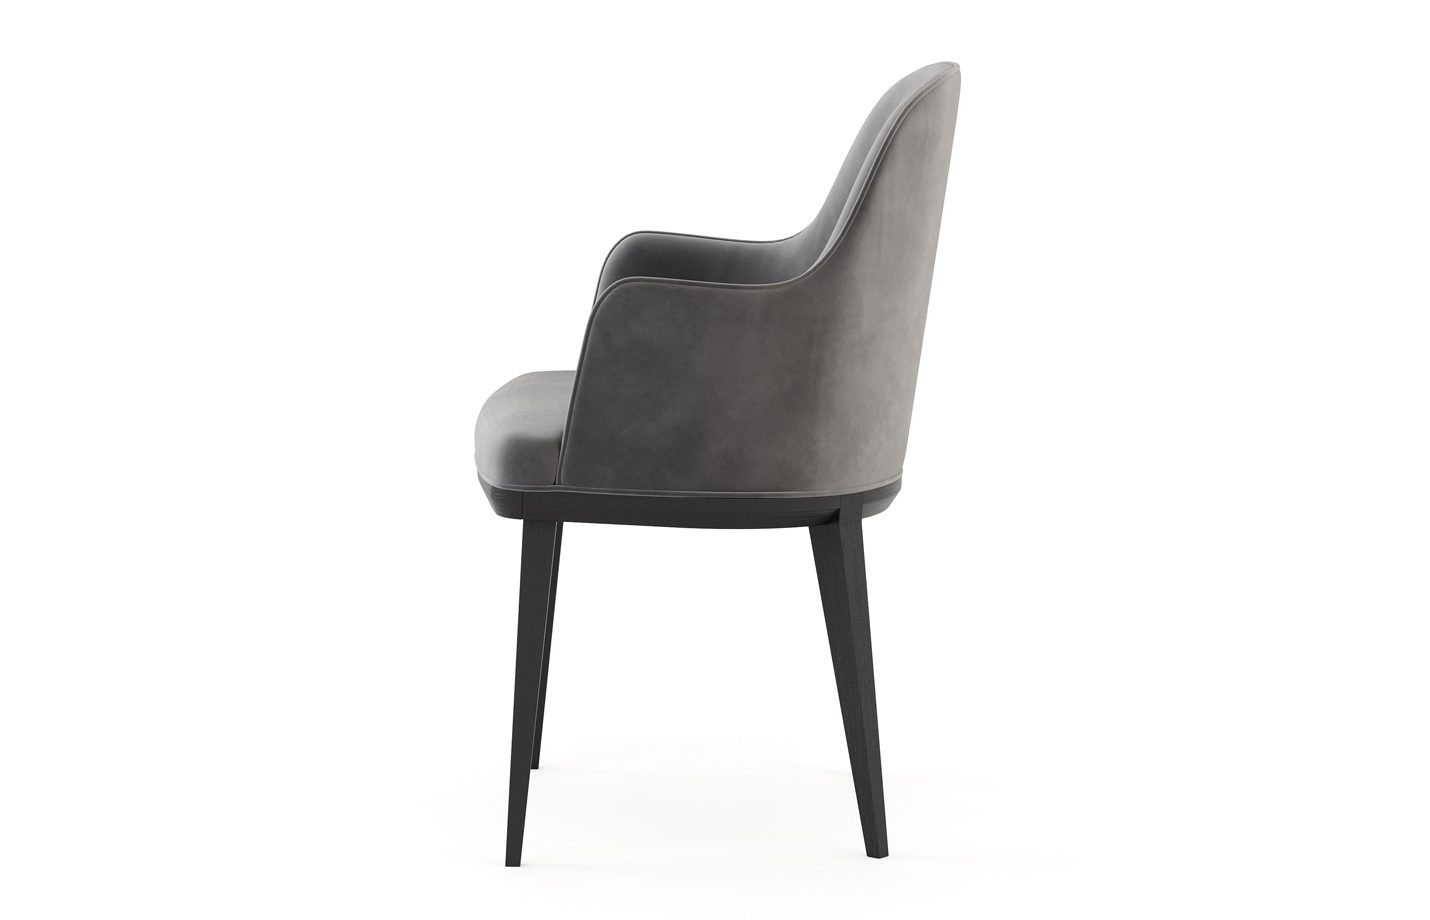 Fritillary-Armchair-by-fabiia-furniture-signature-3